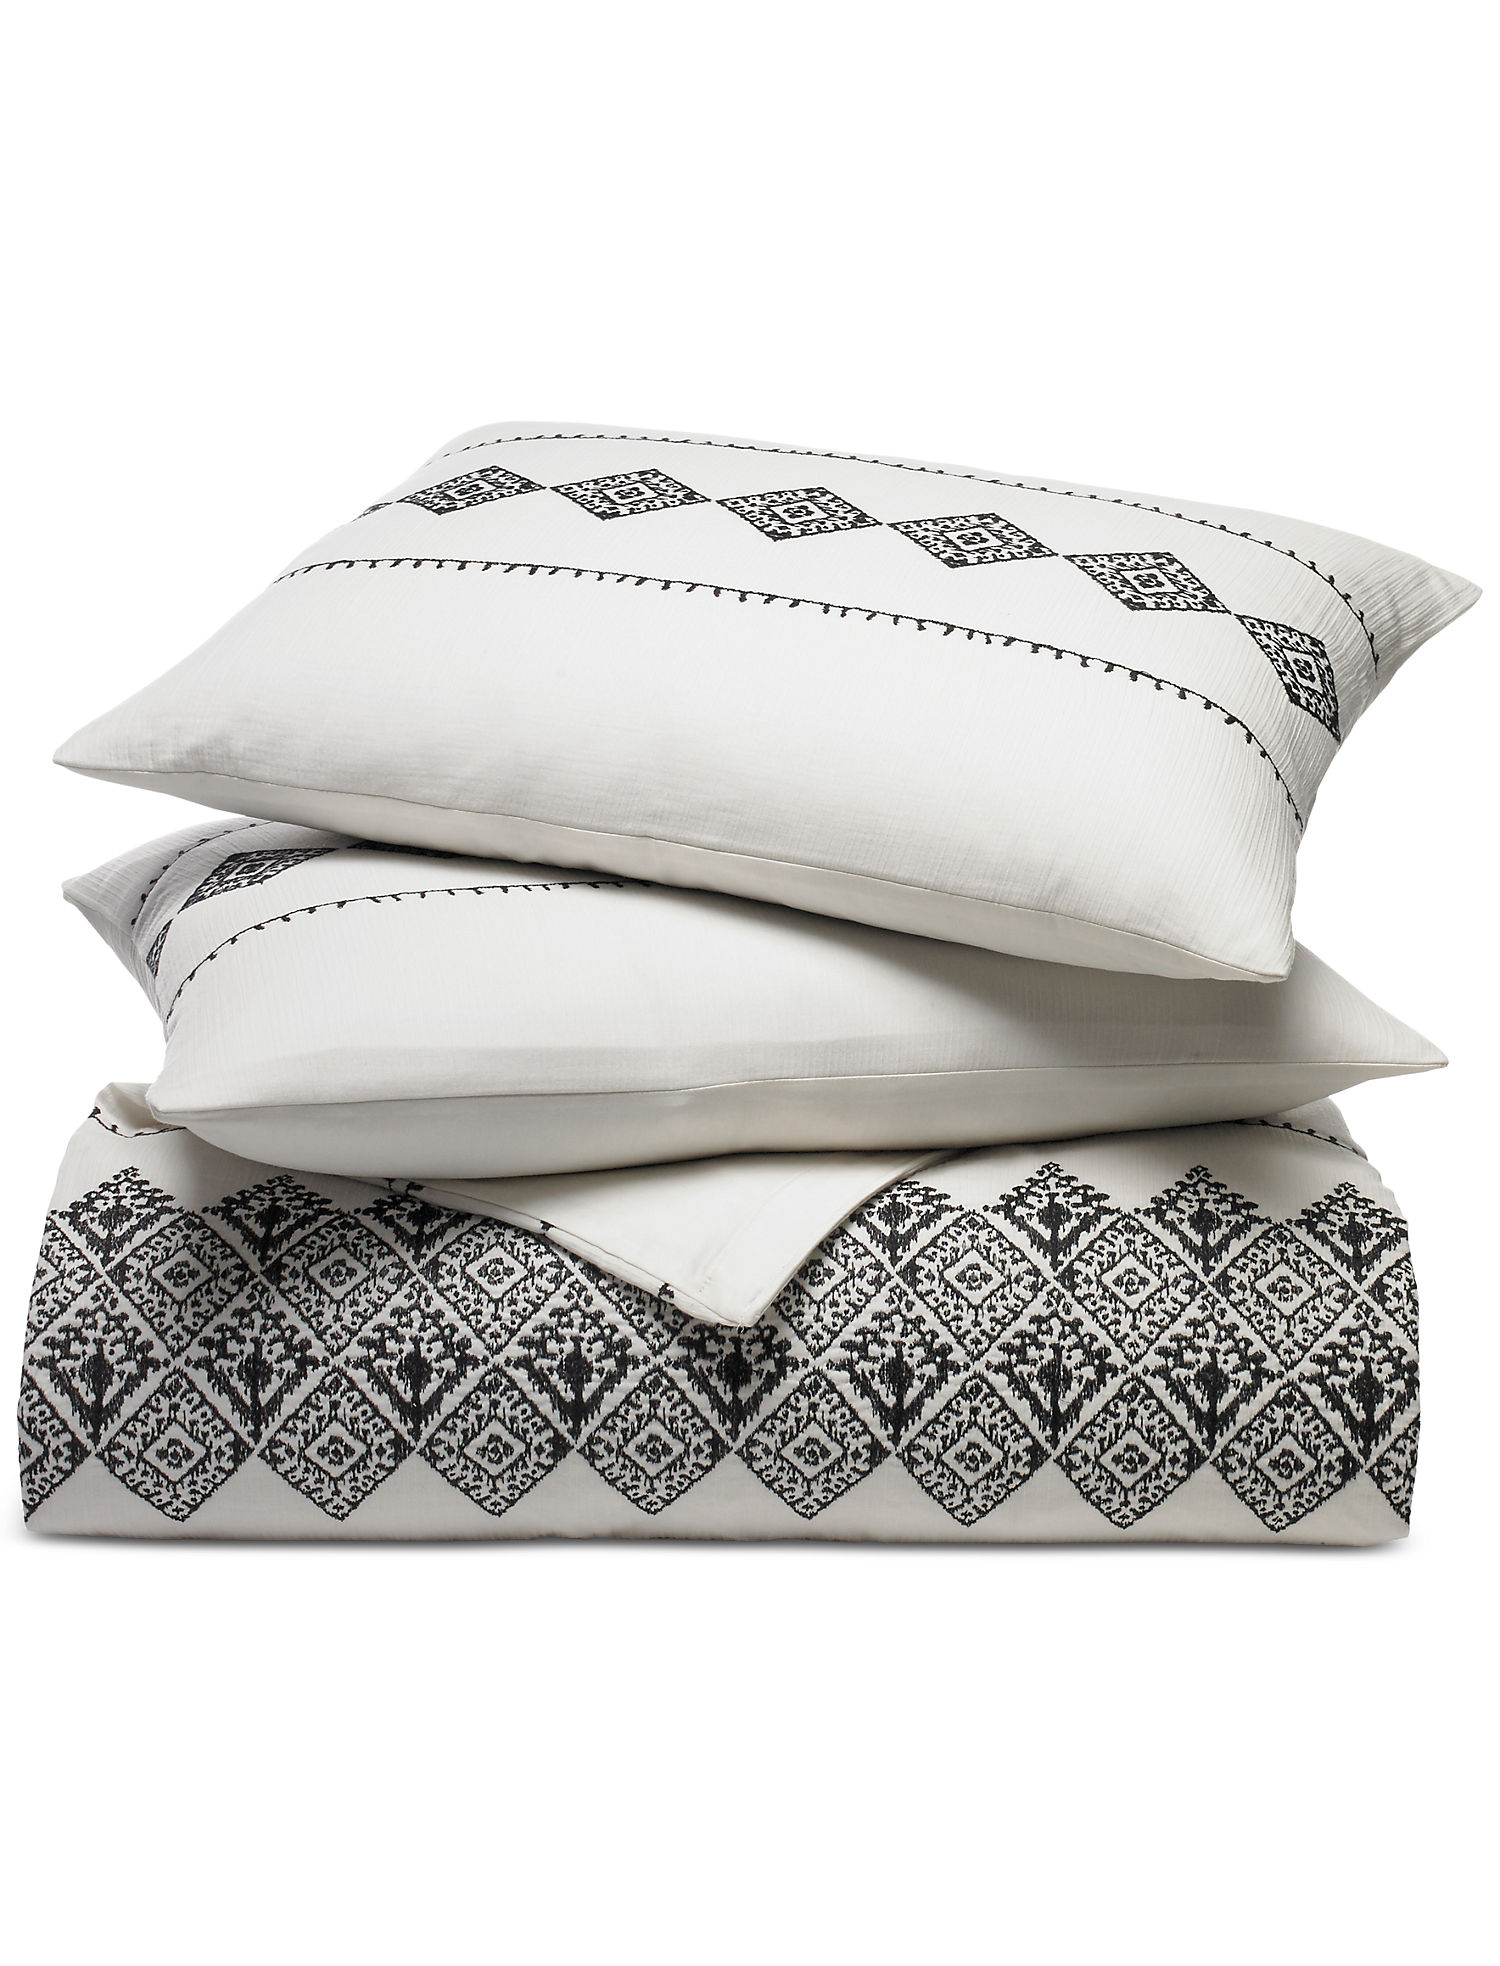 comforter chester and diamond gallery christmas brown bedding set bed ikat reversible viralizam